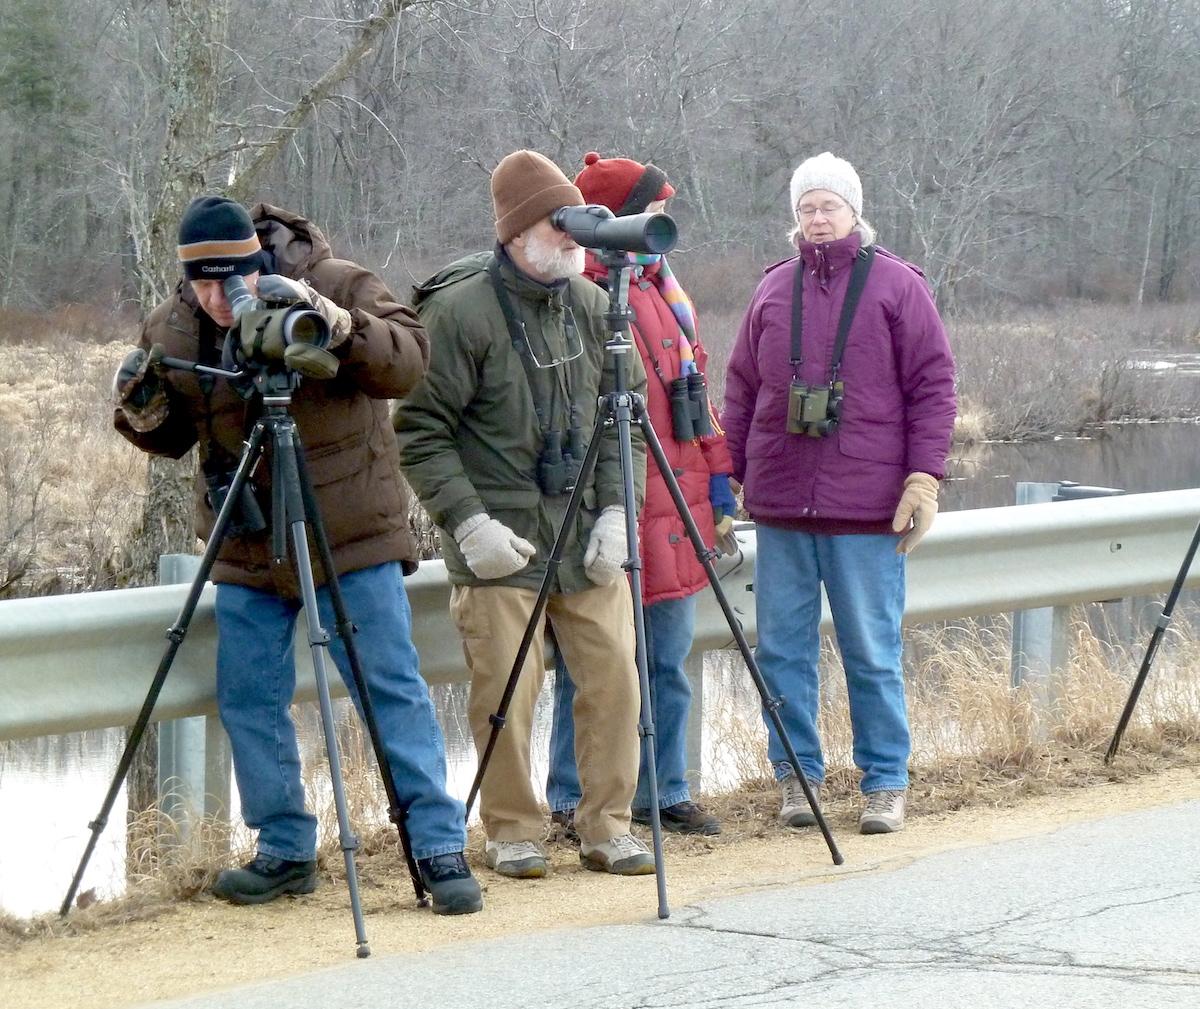 P1040427 Birders w scopes cold day at L Quaboag resized.jpg